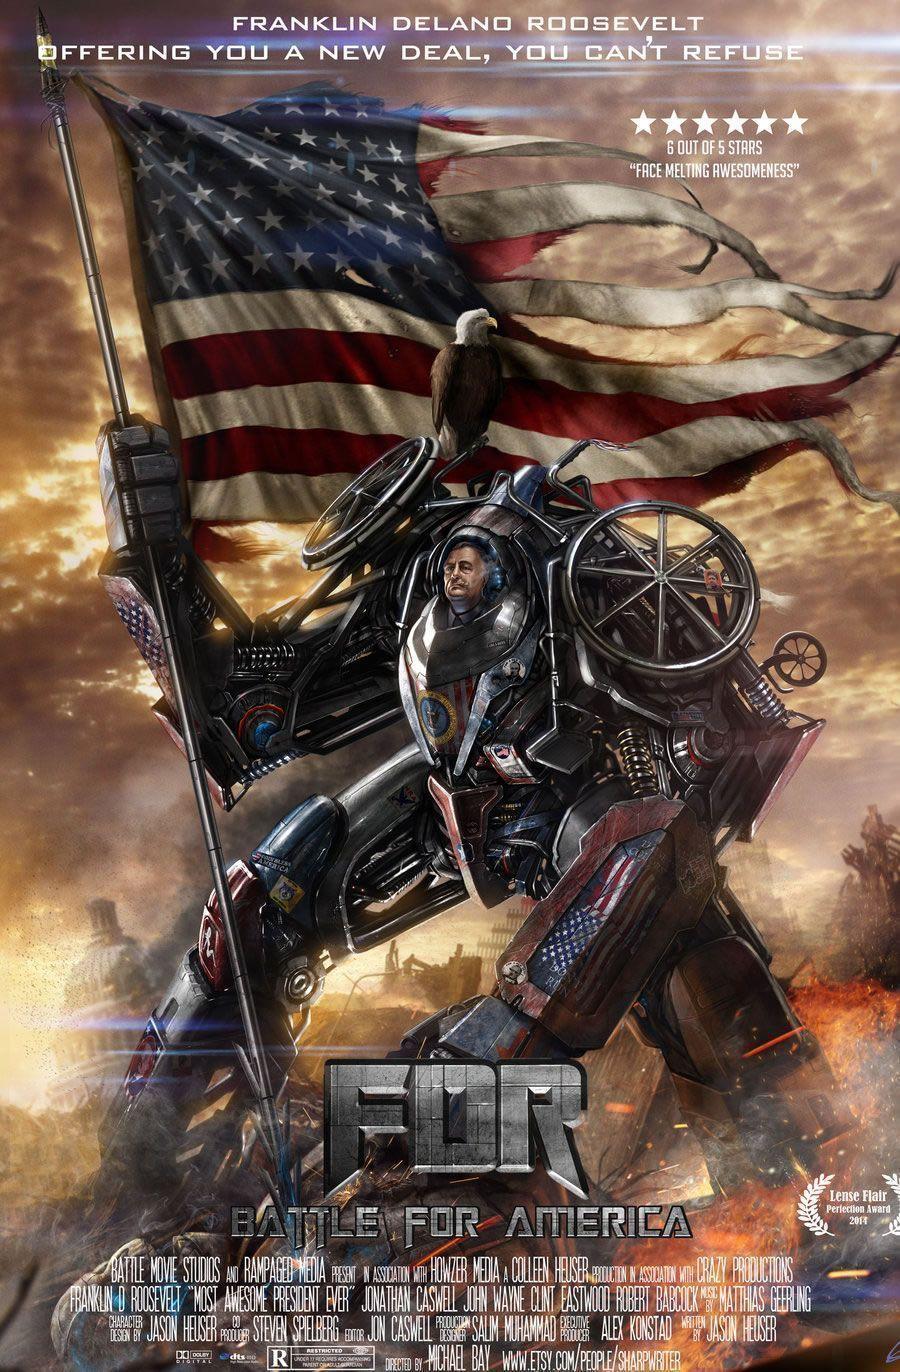 fdr_battle_for_america_poster_by_sharpwriter-d46kt1m